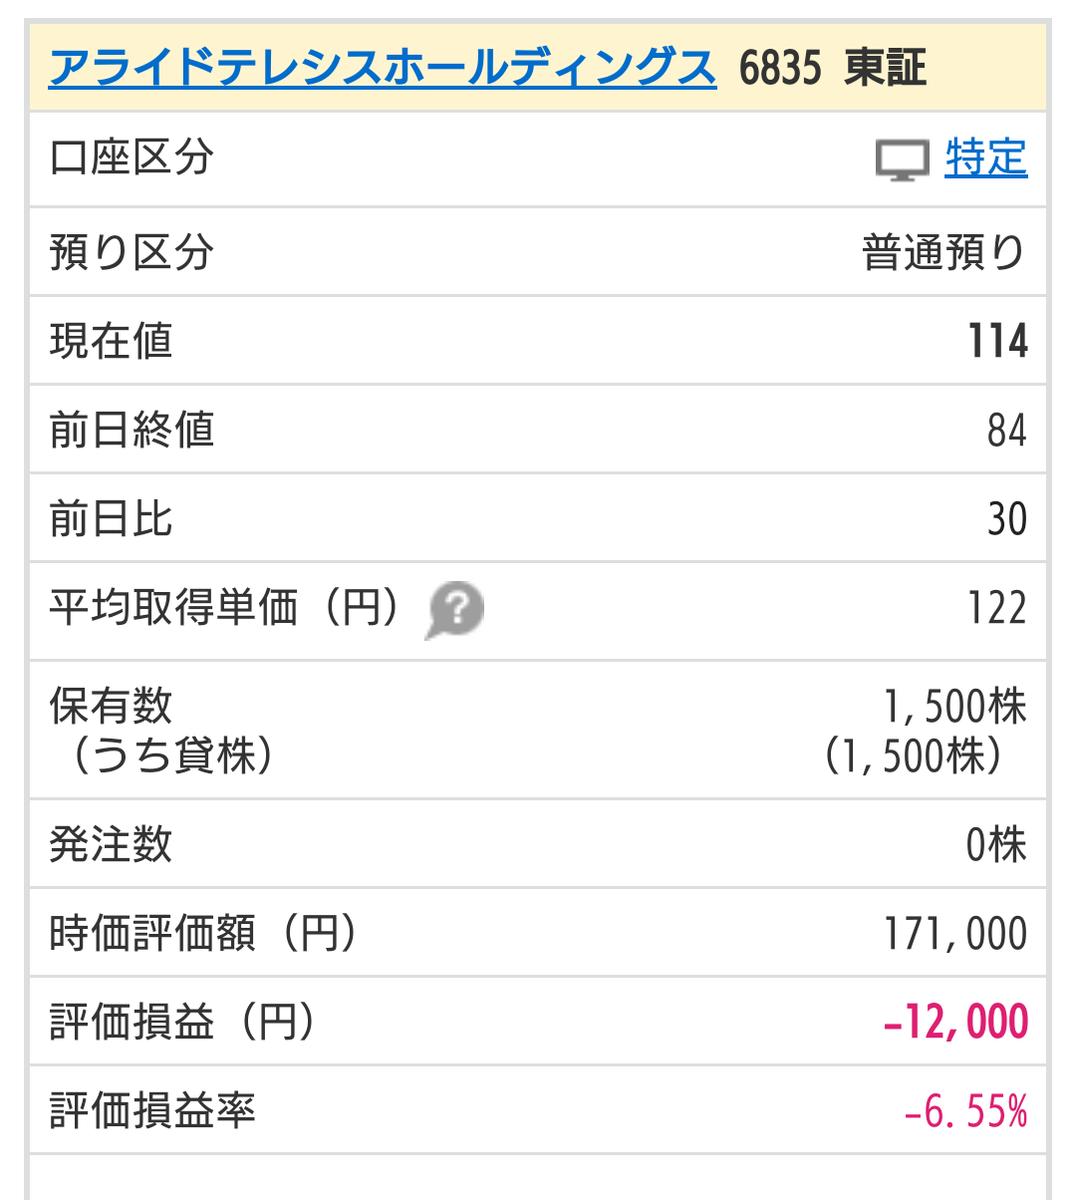 f:id:Kinokawaryokusan:20200610210902p:plain